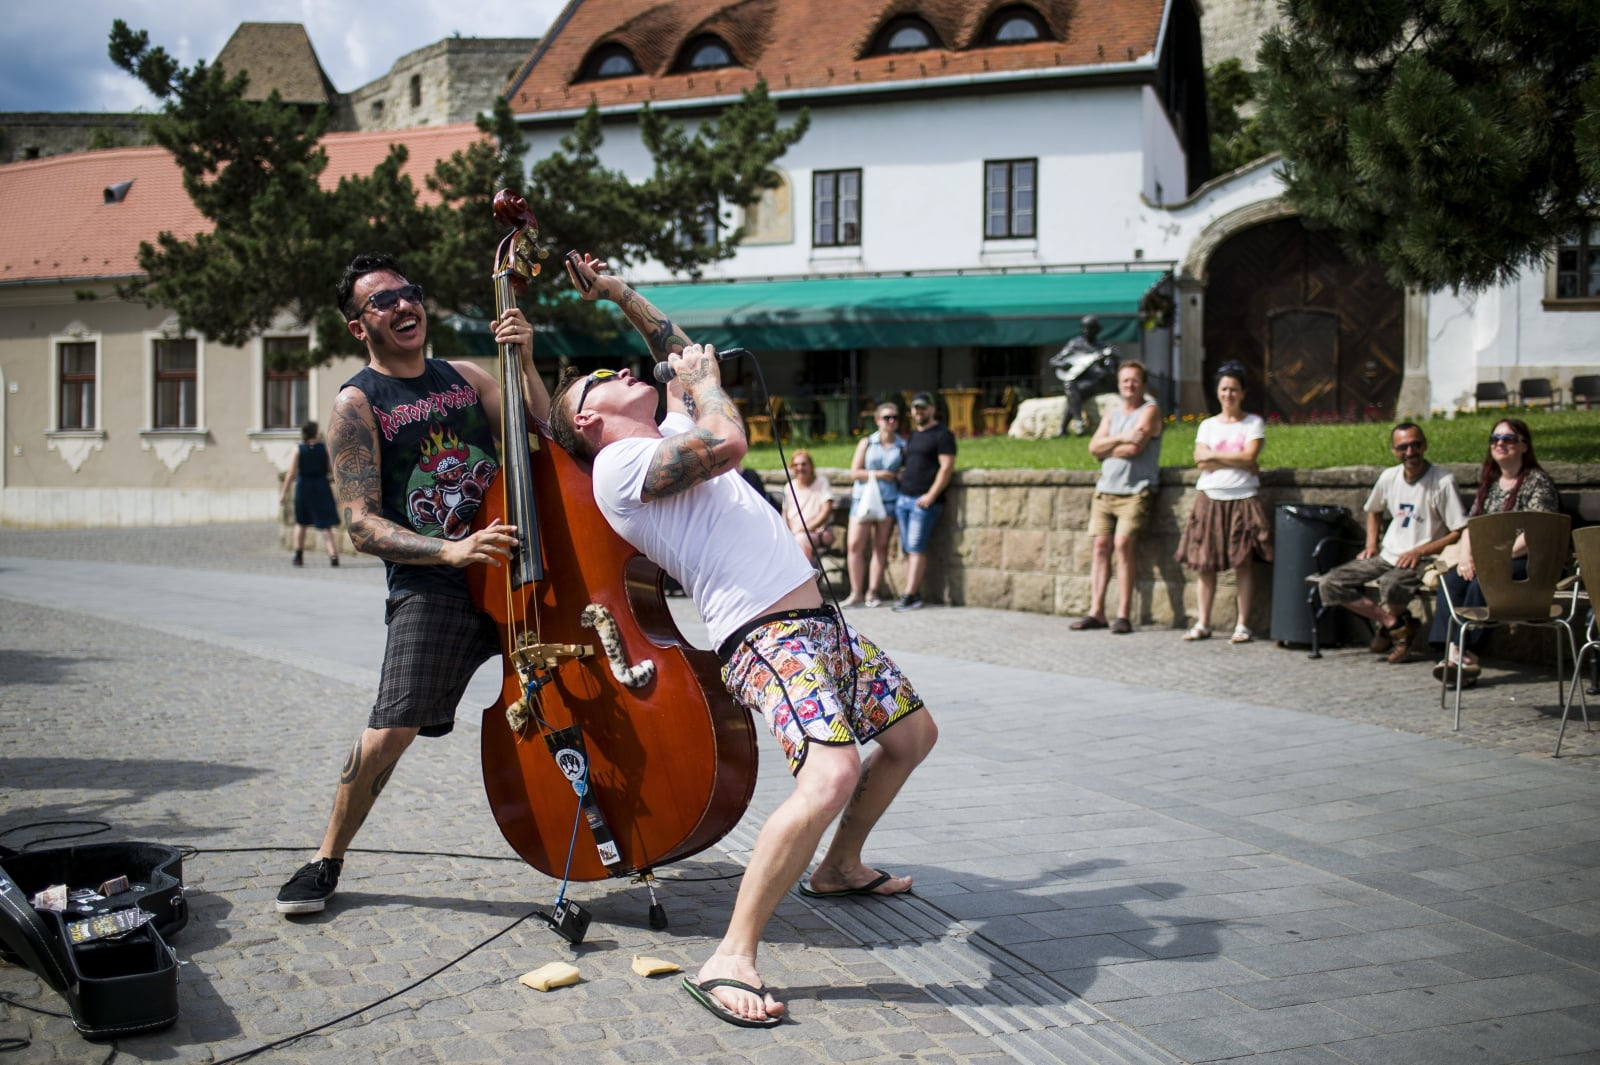 Dzień muzyczny na Węgrzech fot. EPA/Peter Komka HUNGARY OUT  Dostawca: PAP/EPA.